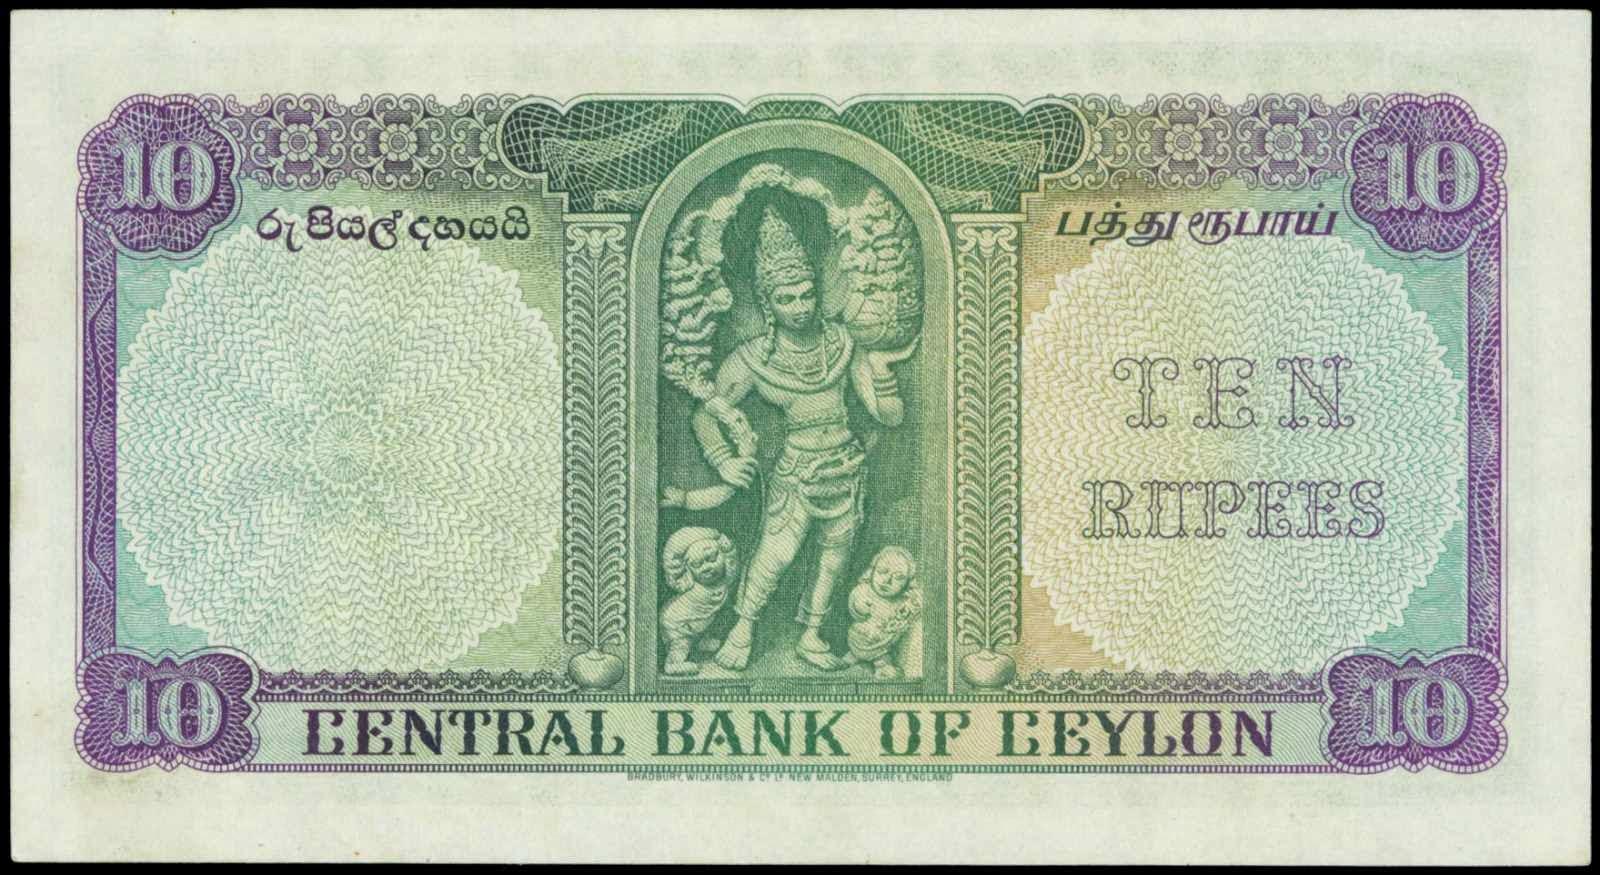 Ceylon 10 Rupees banknote 1954